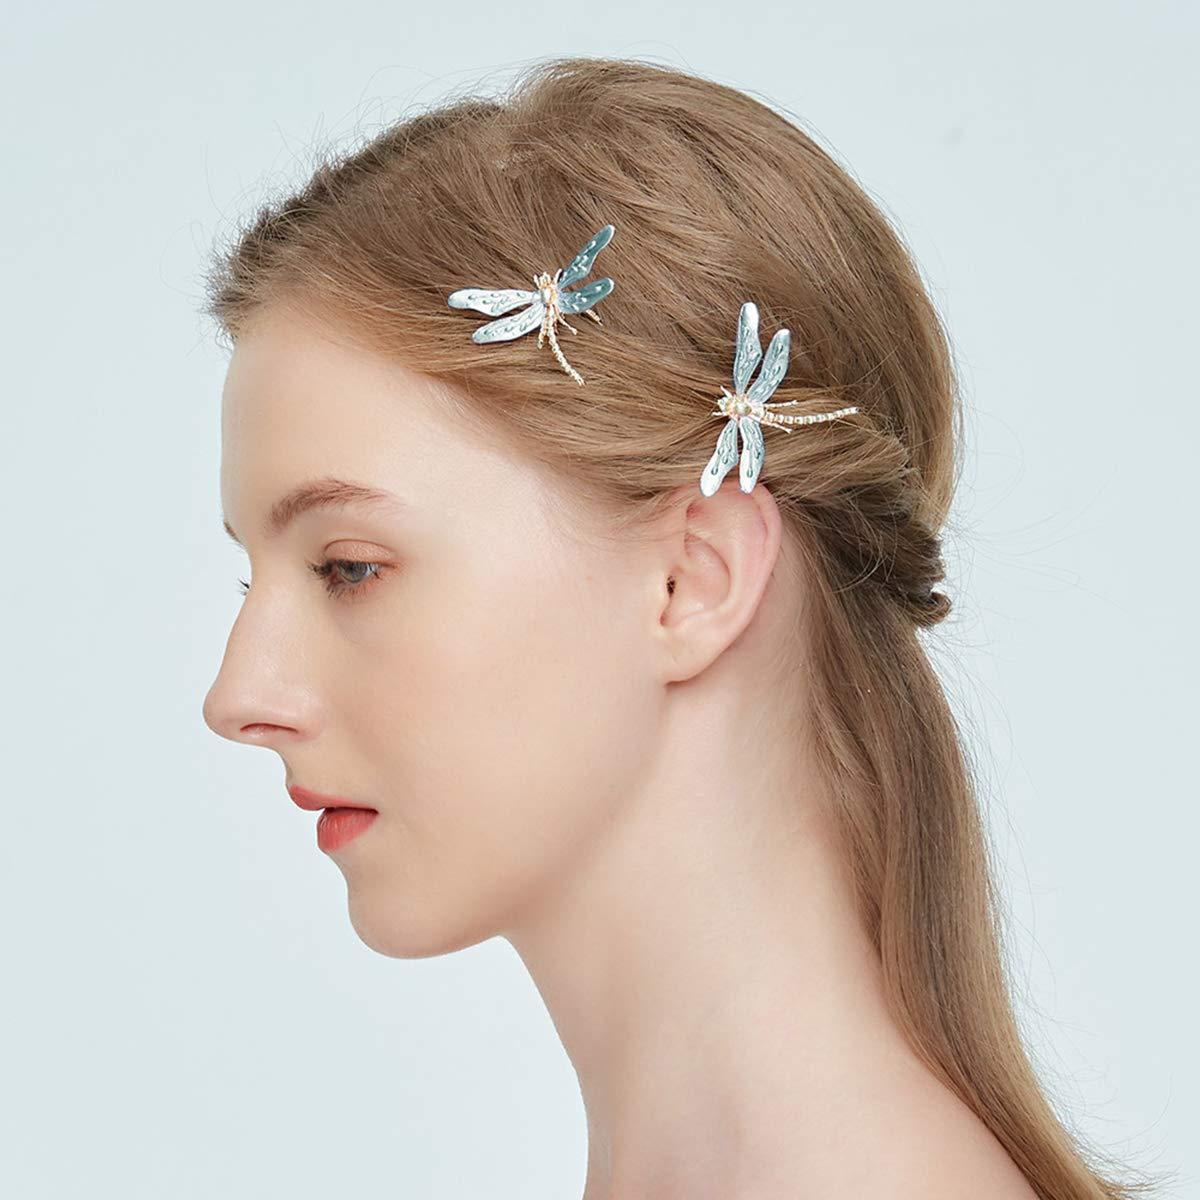 Amazon 2 Pack Elekfx Wedding Hair Combs Hair Accessories